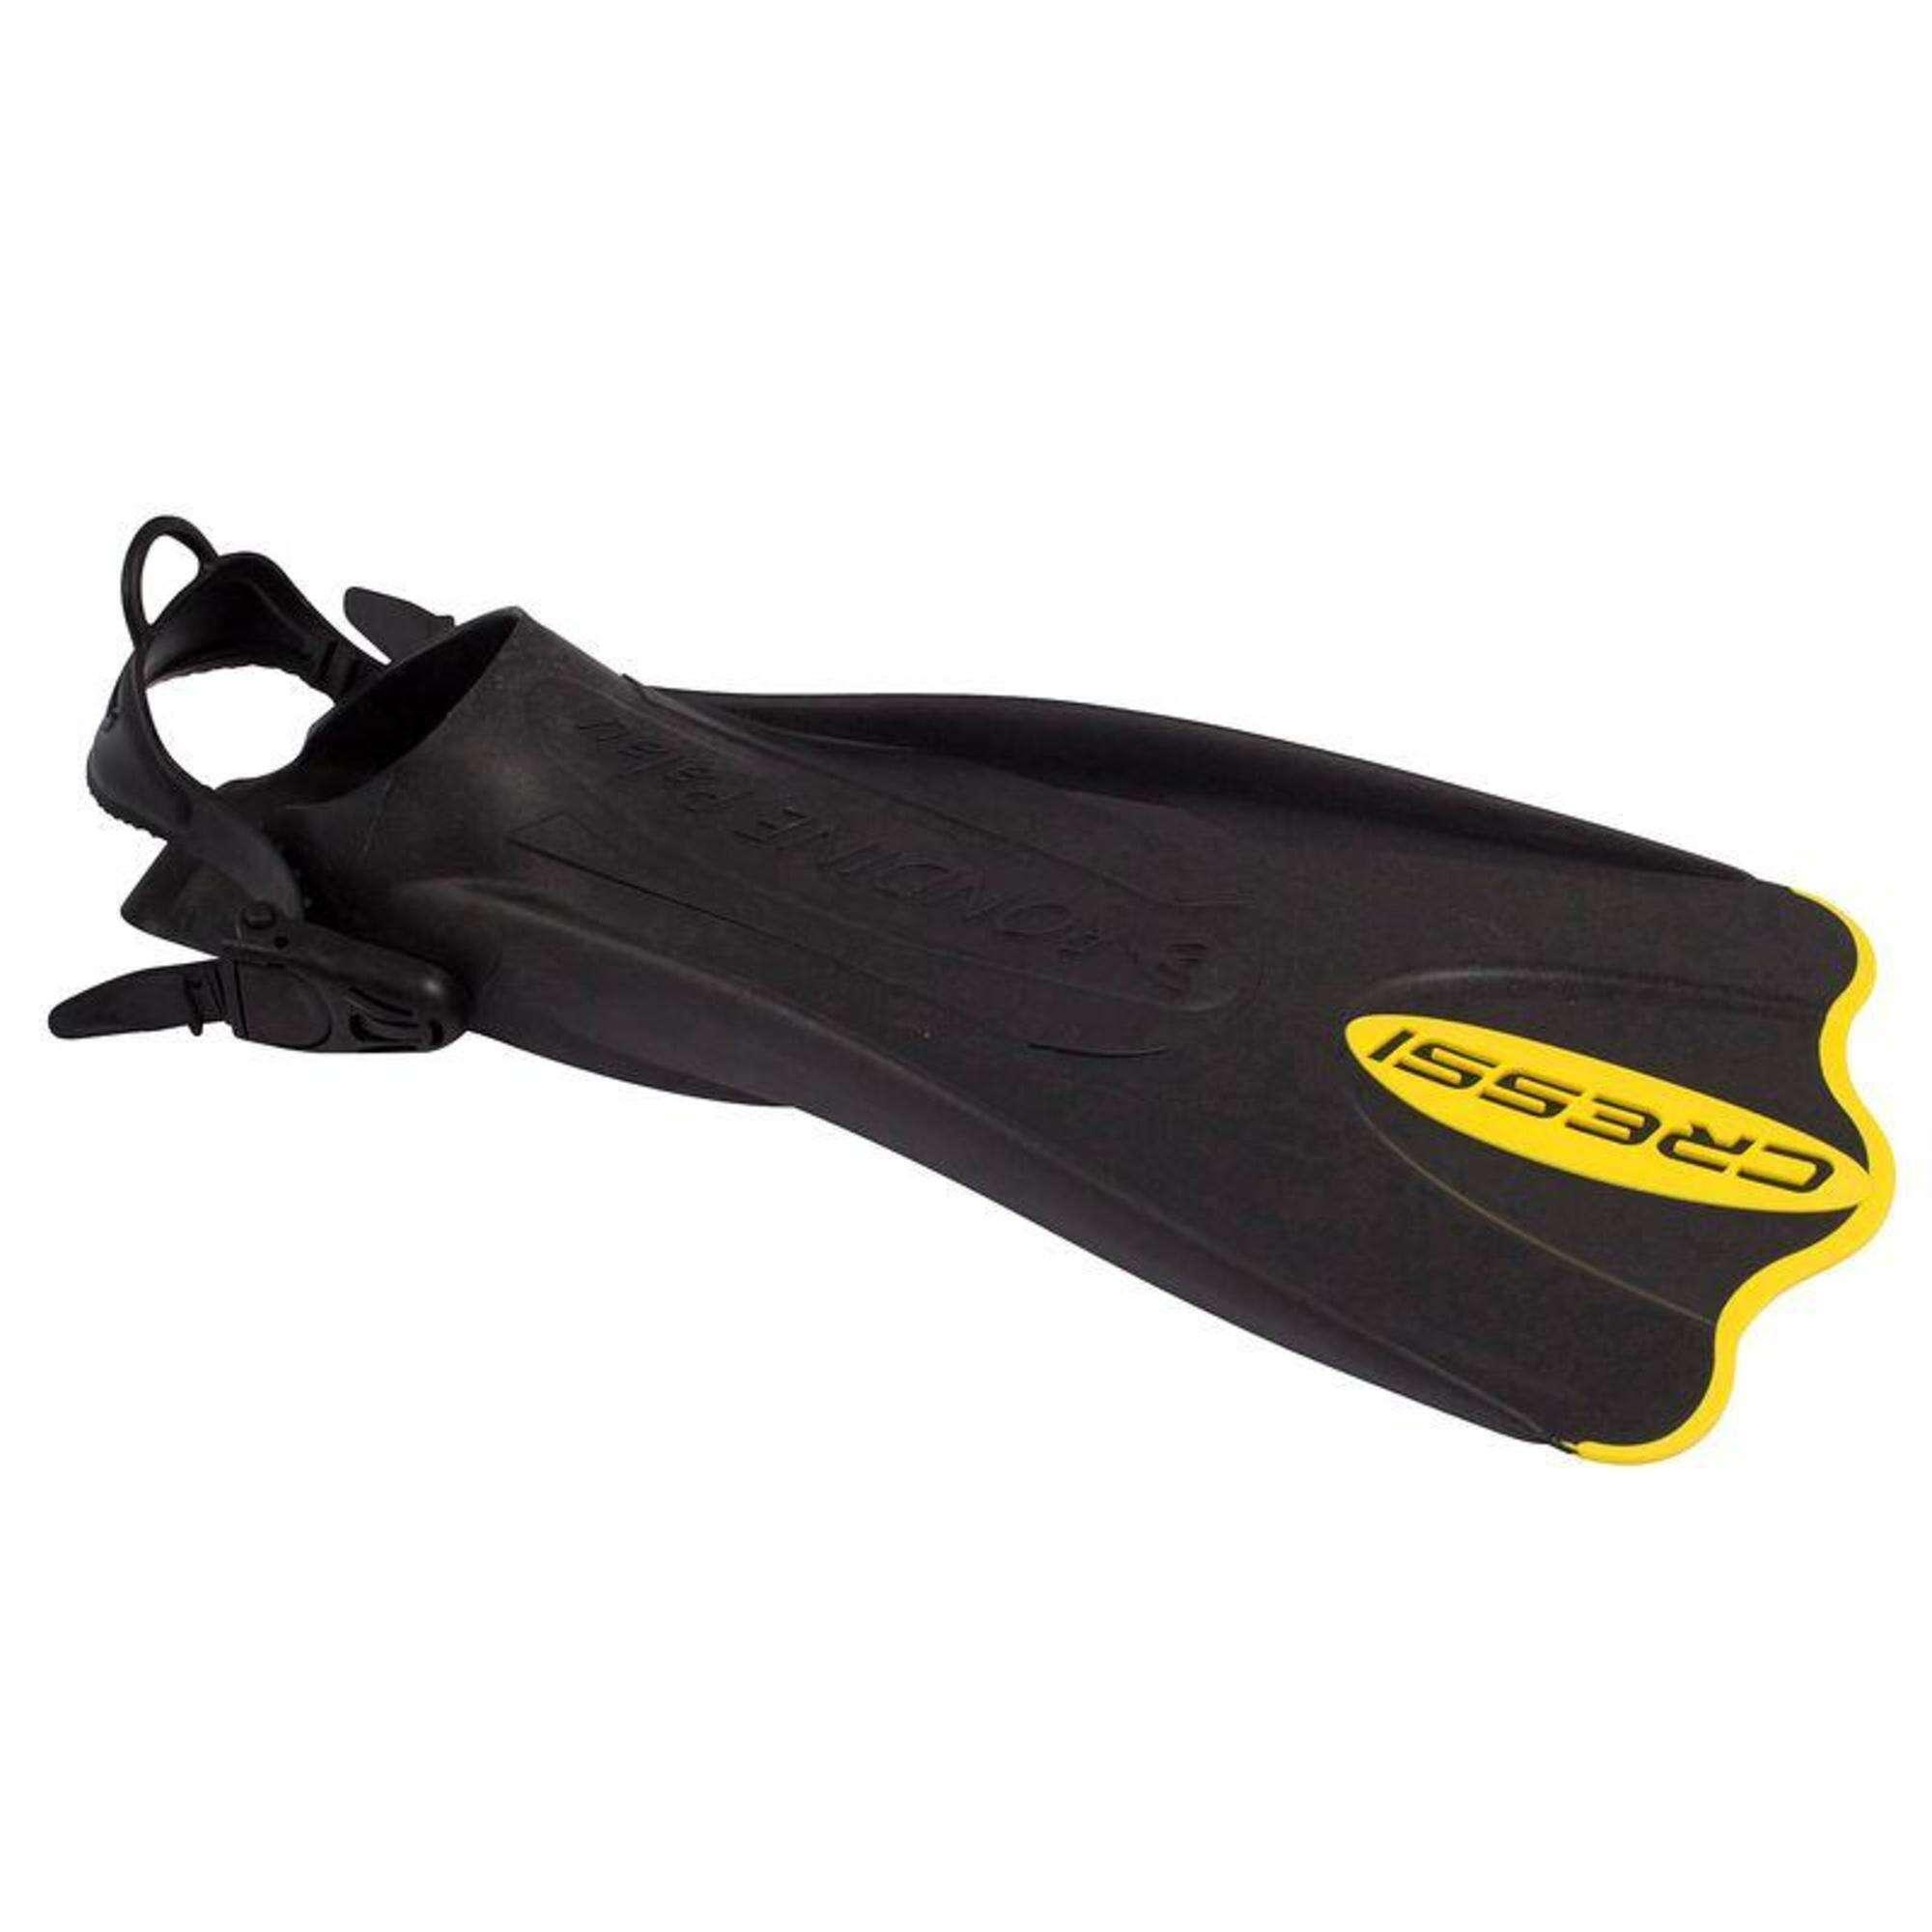 PINNE SNORKELING Sport Acquatici - Pinne snorkeling adulto Palau Saf CRESSI - Pinne e Kit snorkeling